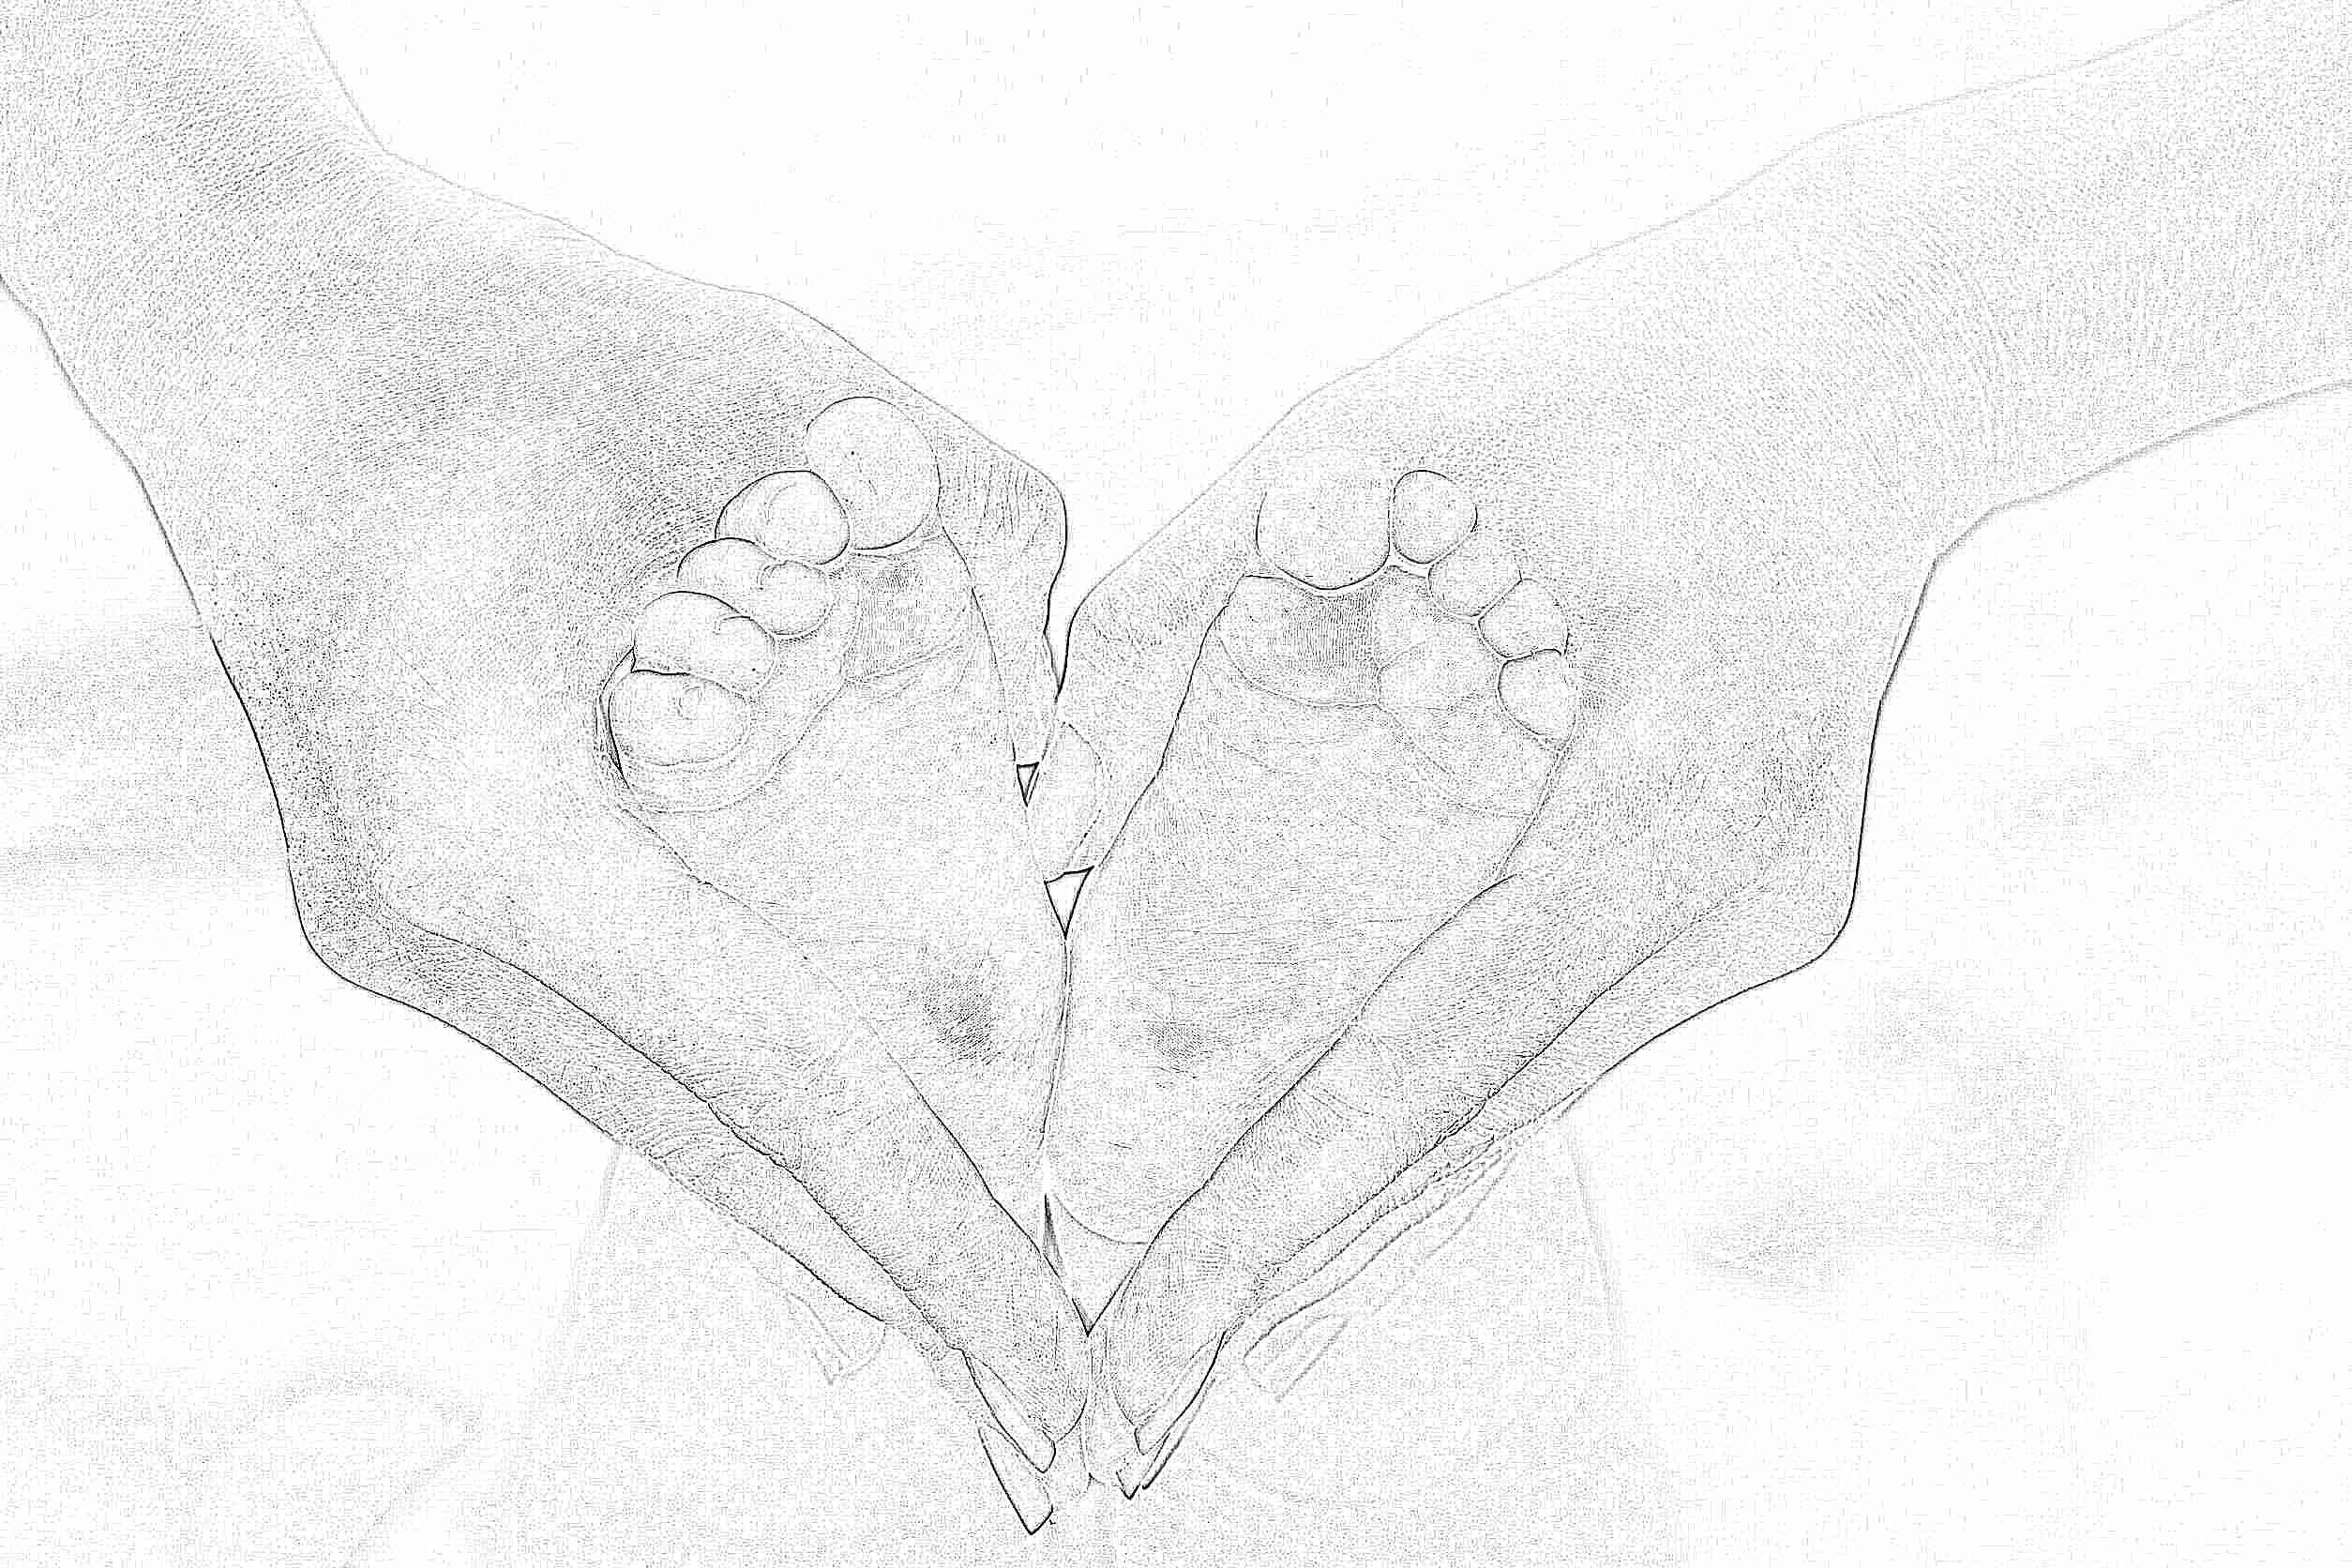 Лечение плоскостопия массажем, техника массажа при плоскостопии, массаж при плоскостопии у детей и взрослых